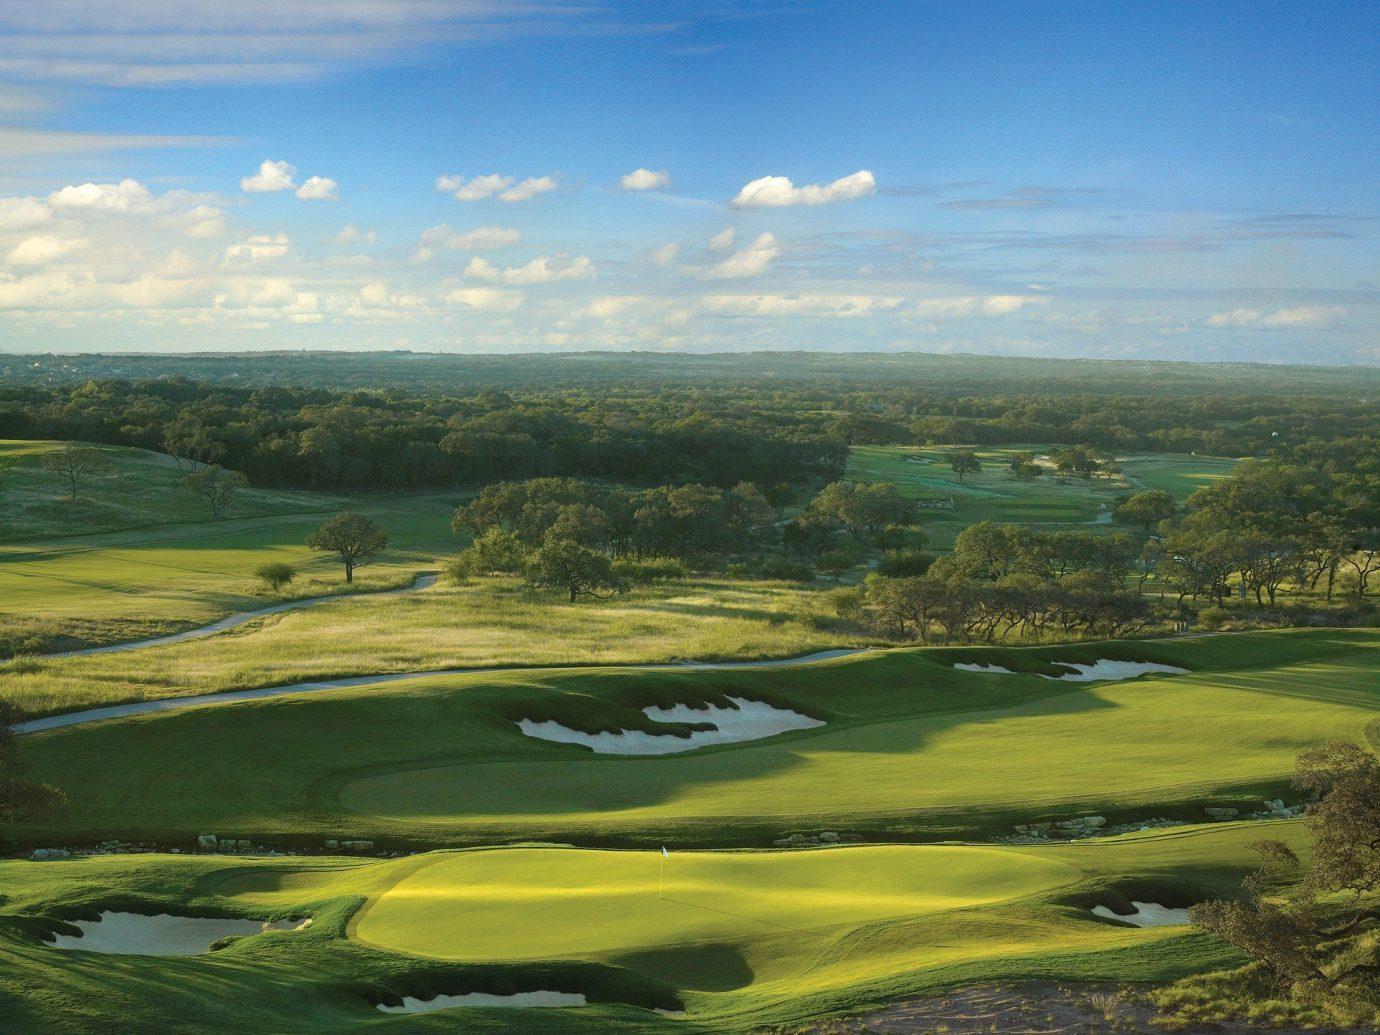 Golf course landscape in San Antonio